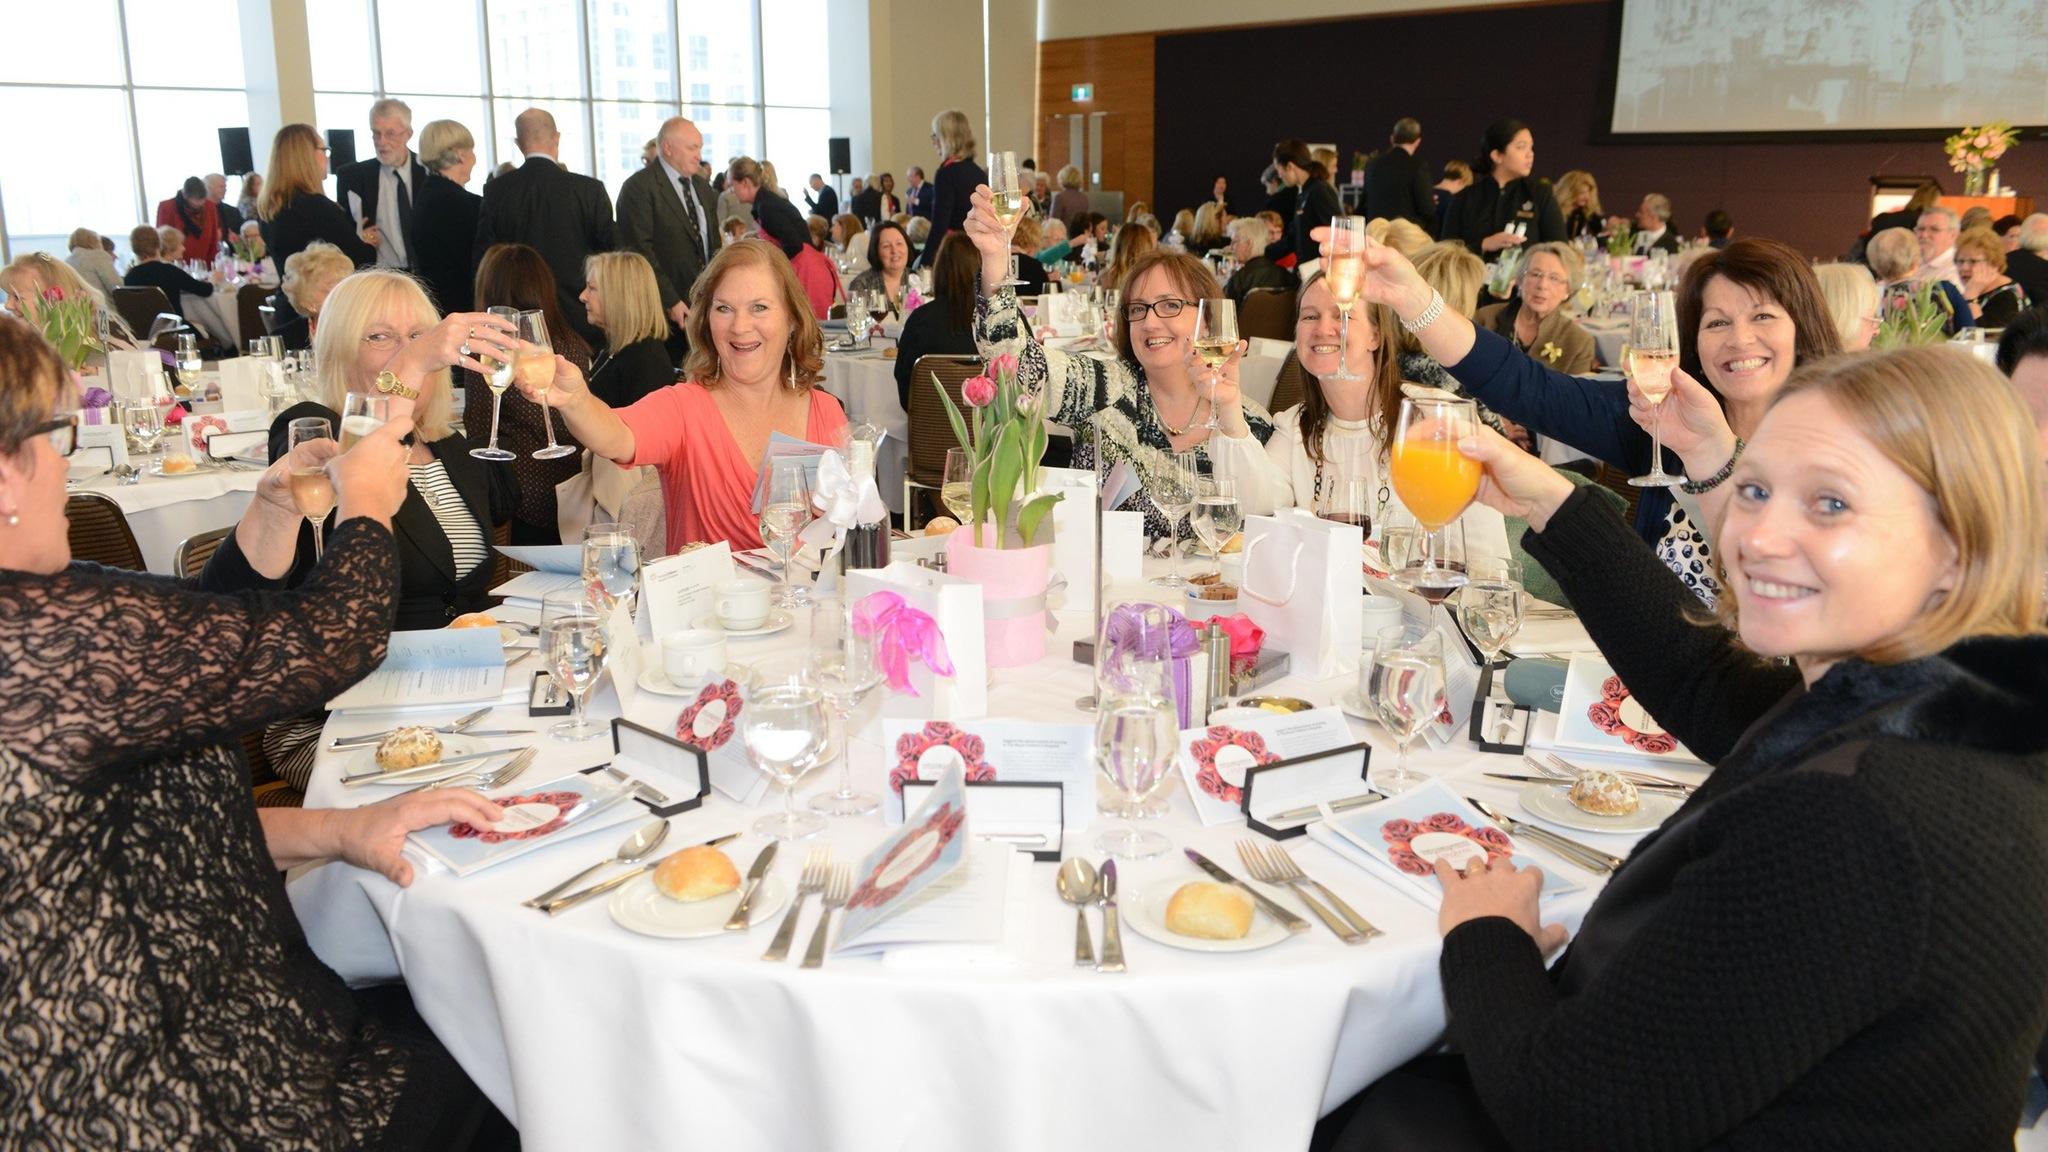 Attendees enjoying the Dame Elisabeth Murdoch Fundraising Luncheon